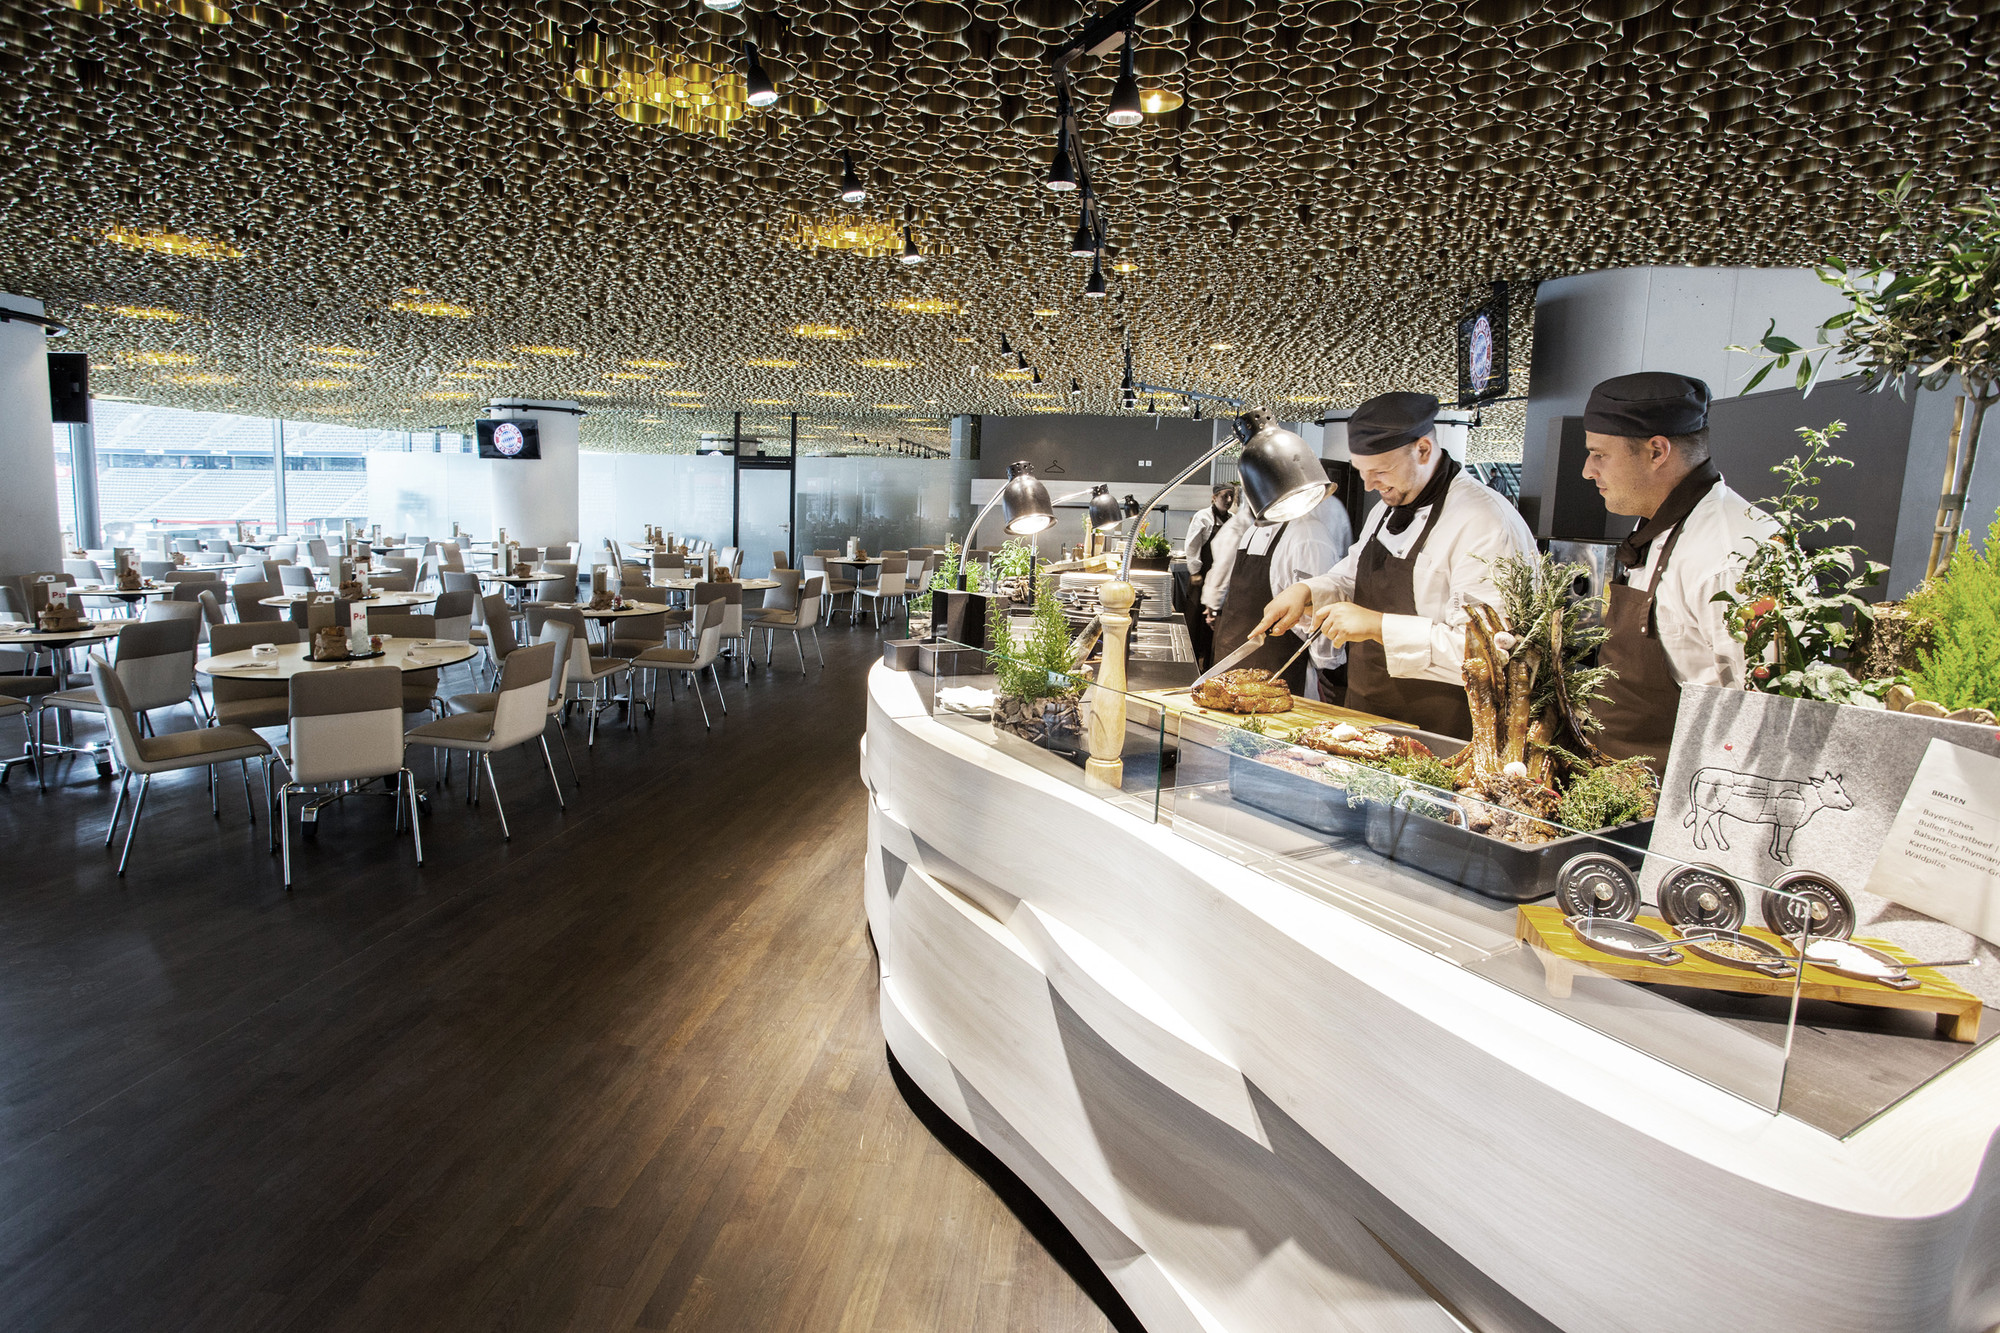 Business Club in the Allianz Arena / CBA Clemens Bachmann Architekten, © Bernd Ducke